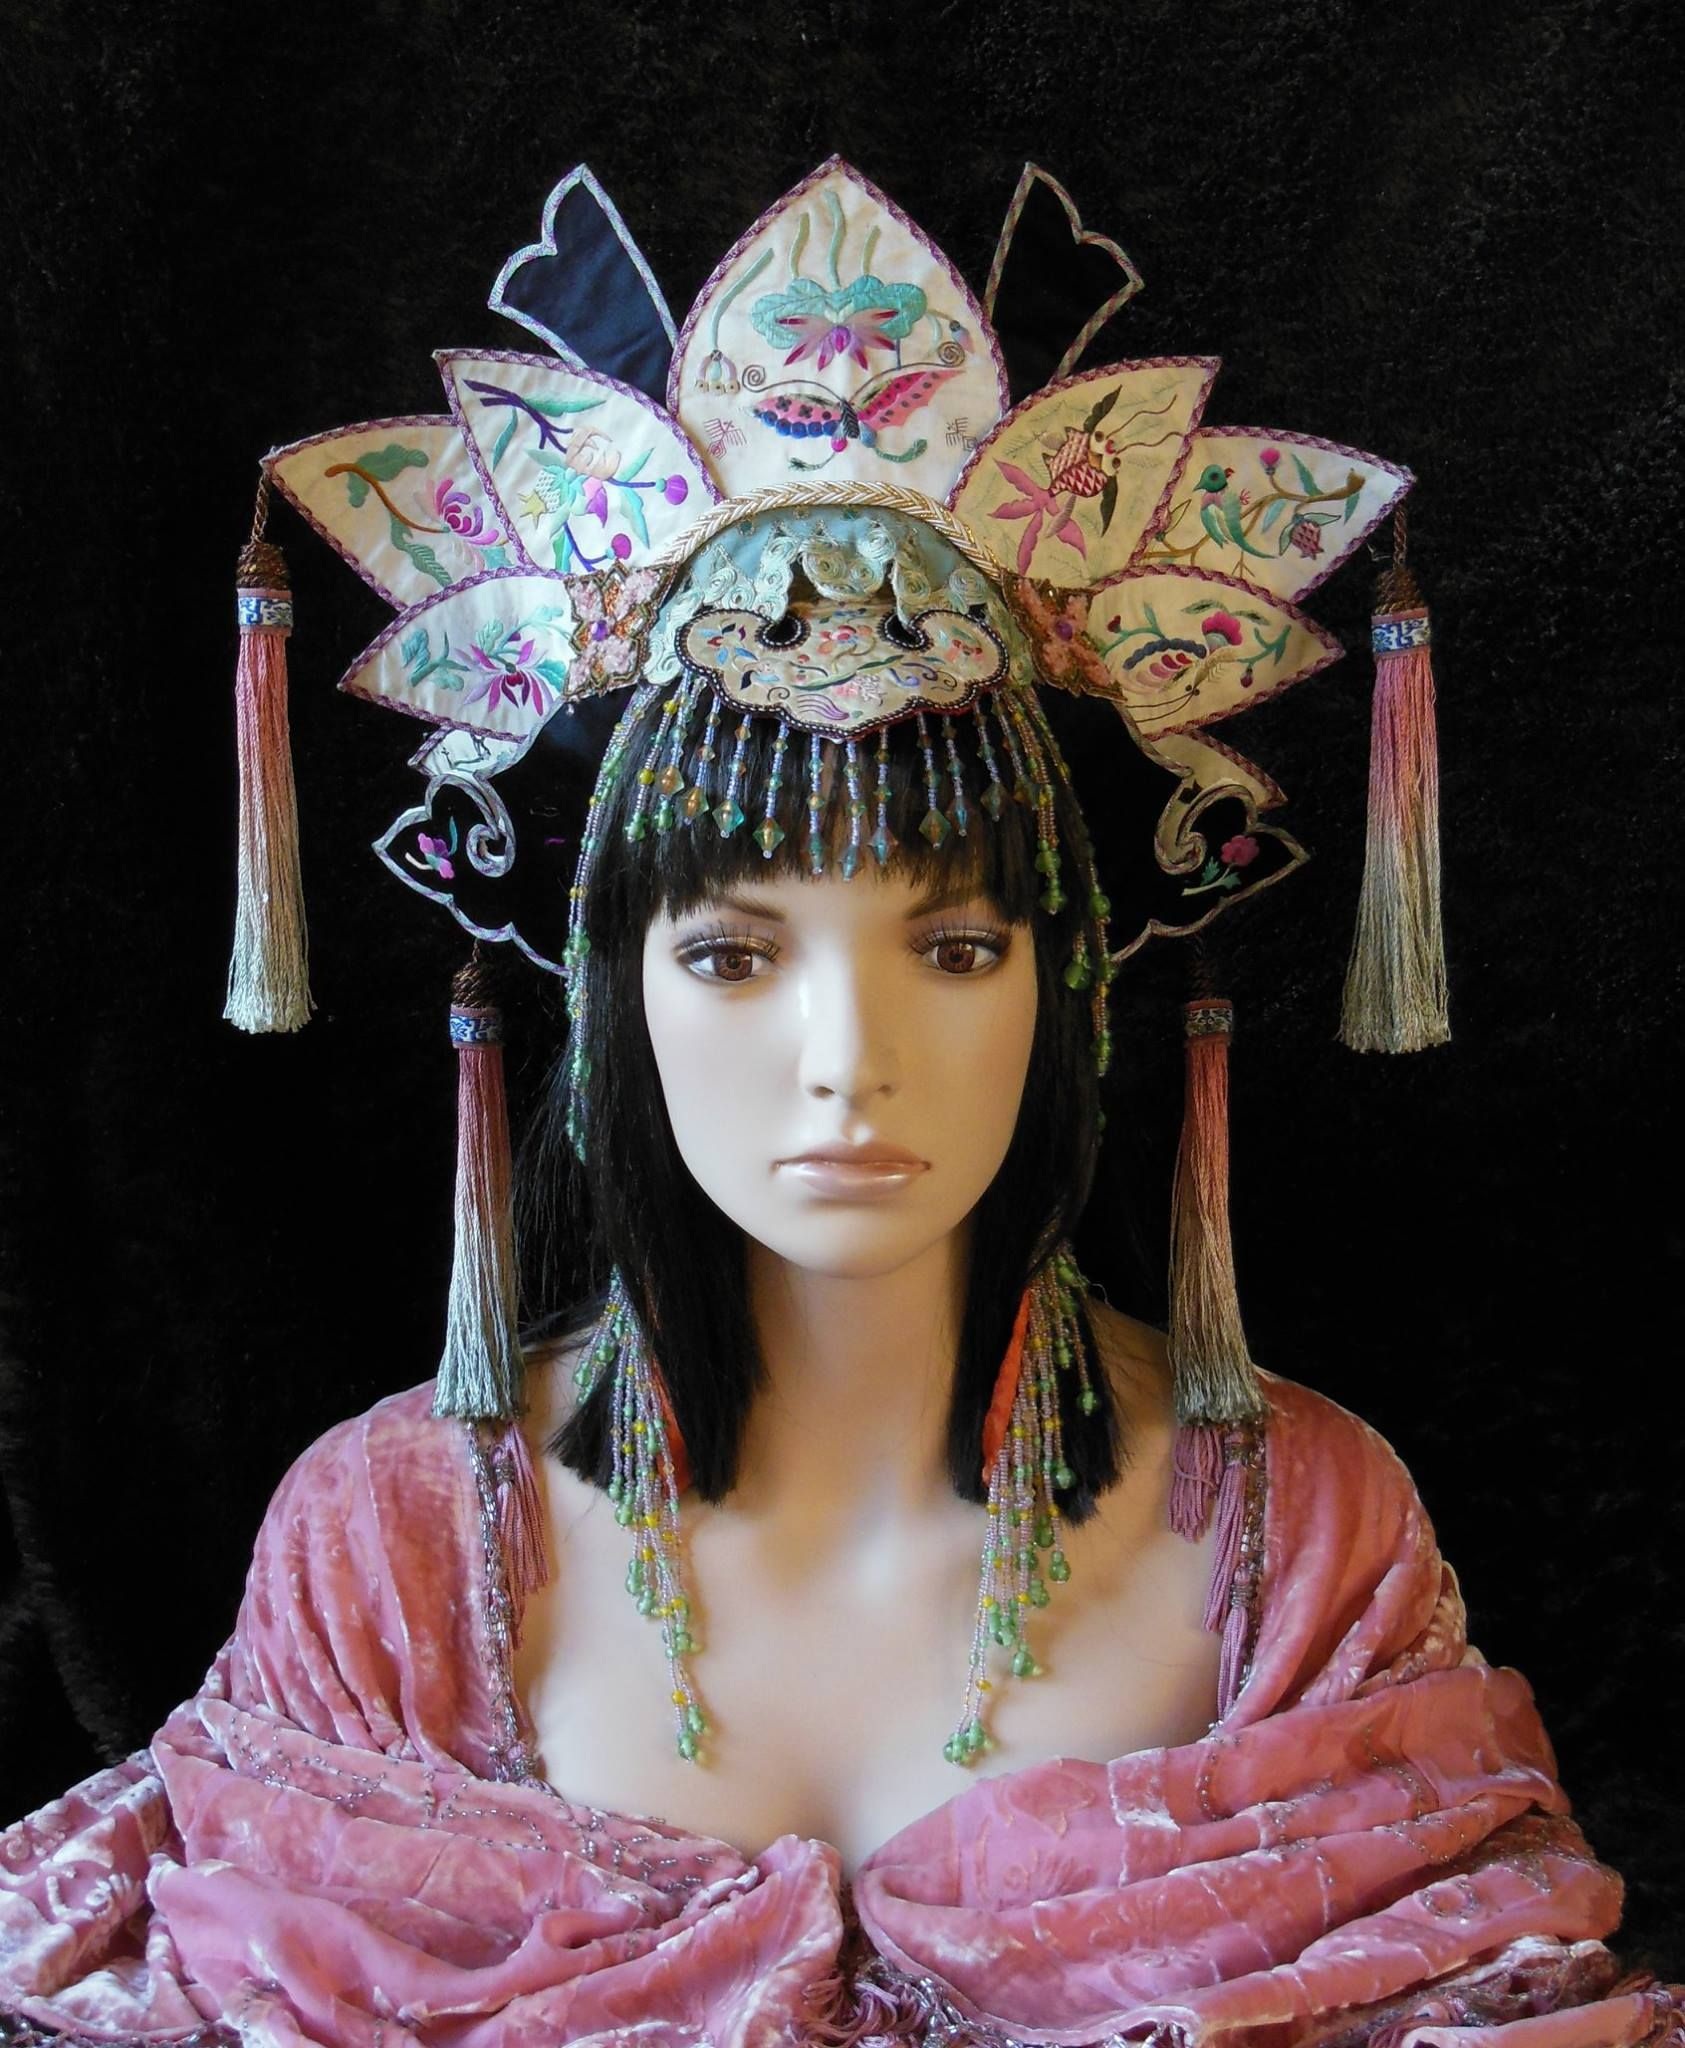 Japanese beauty queens #1